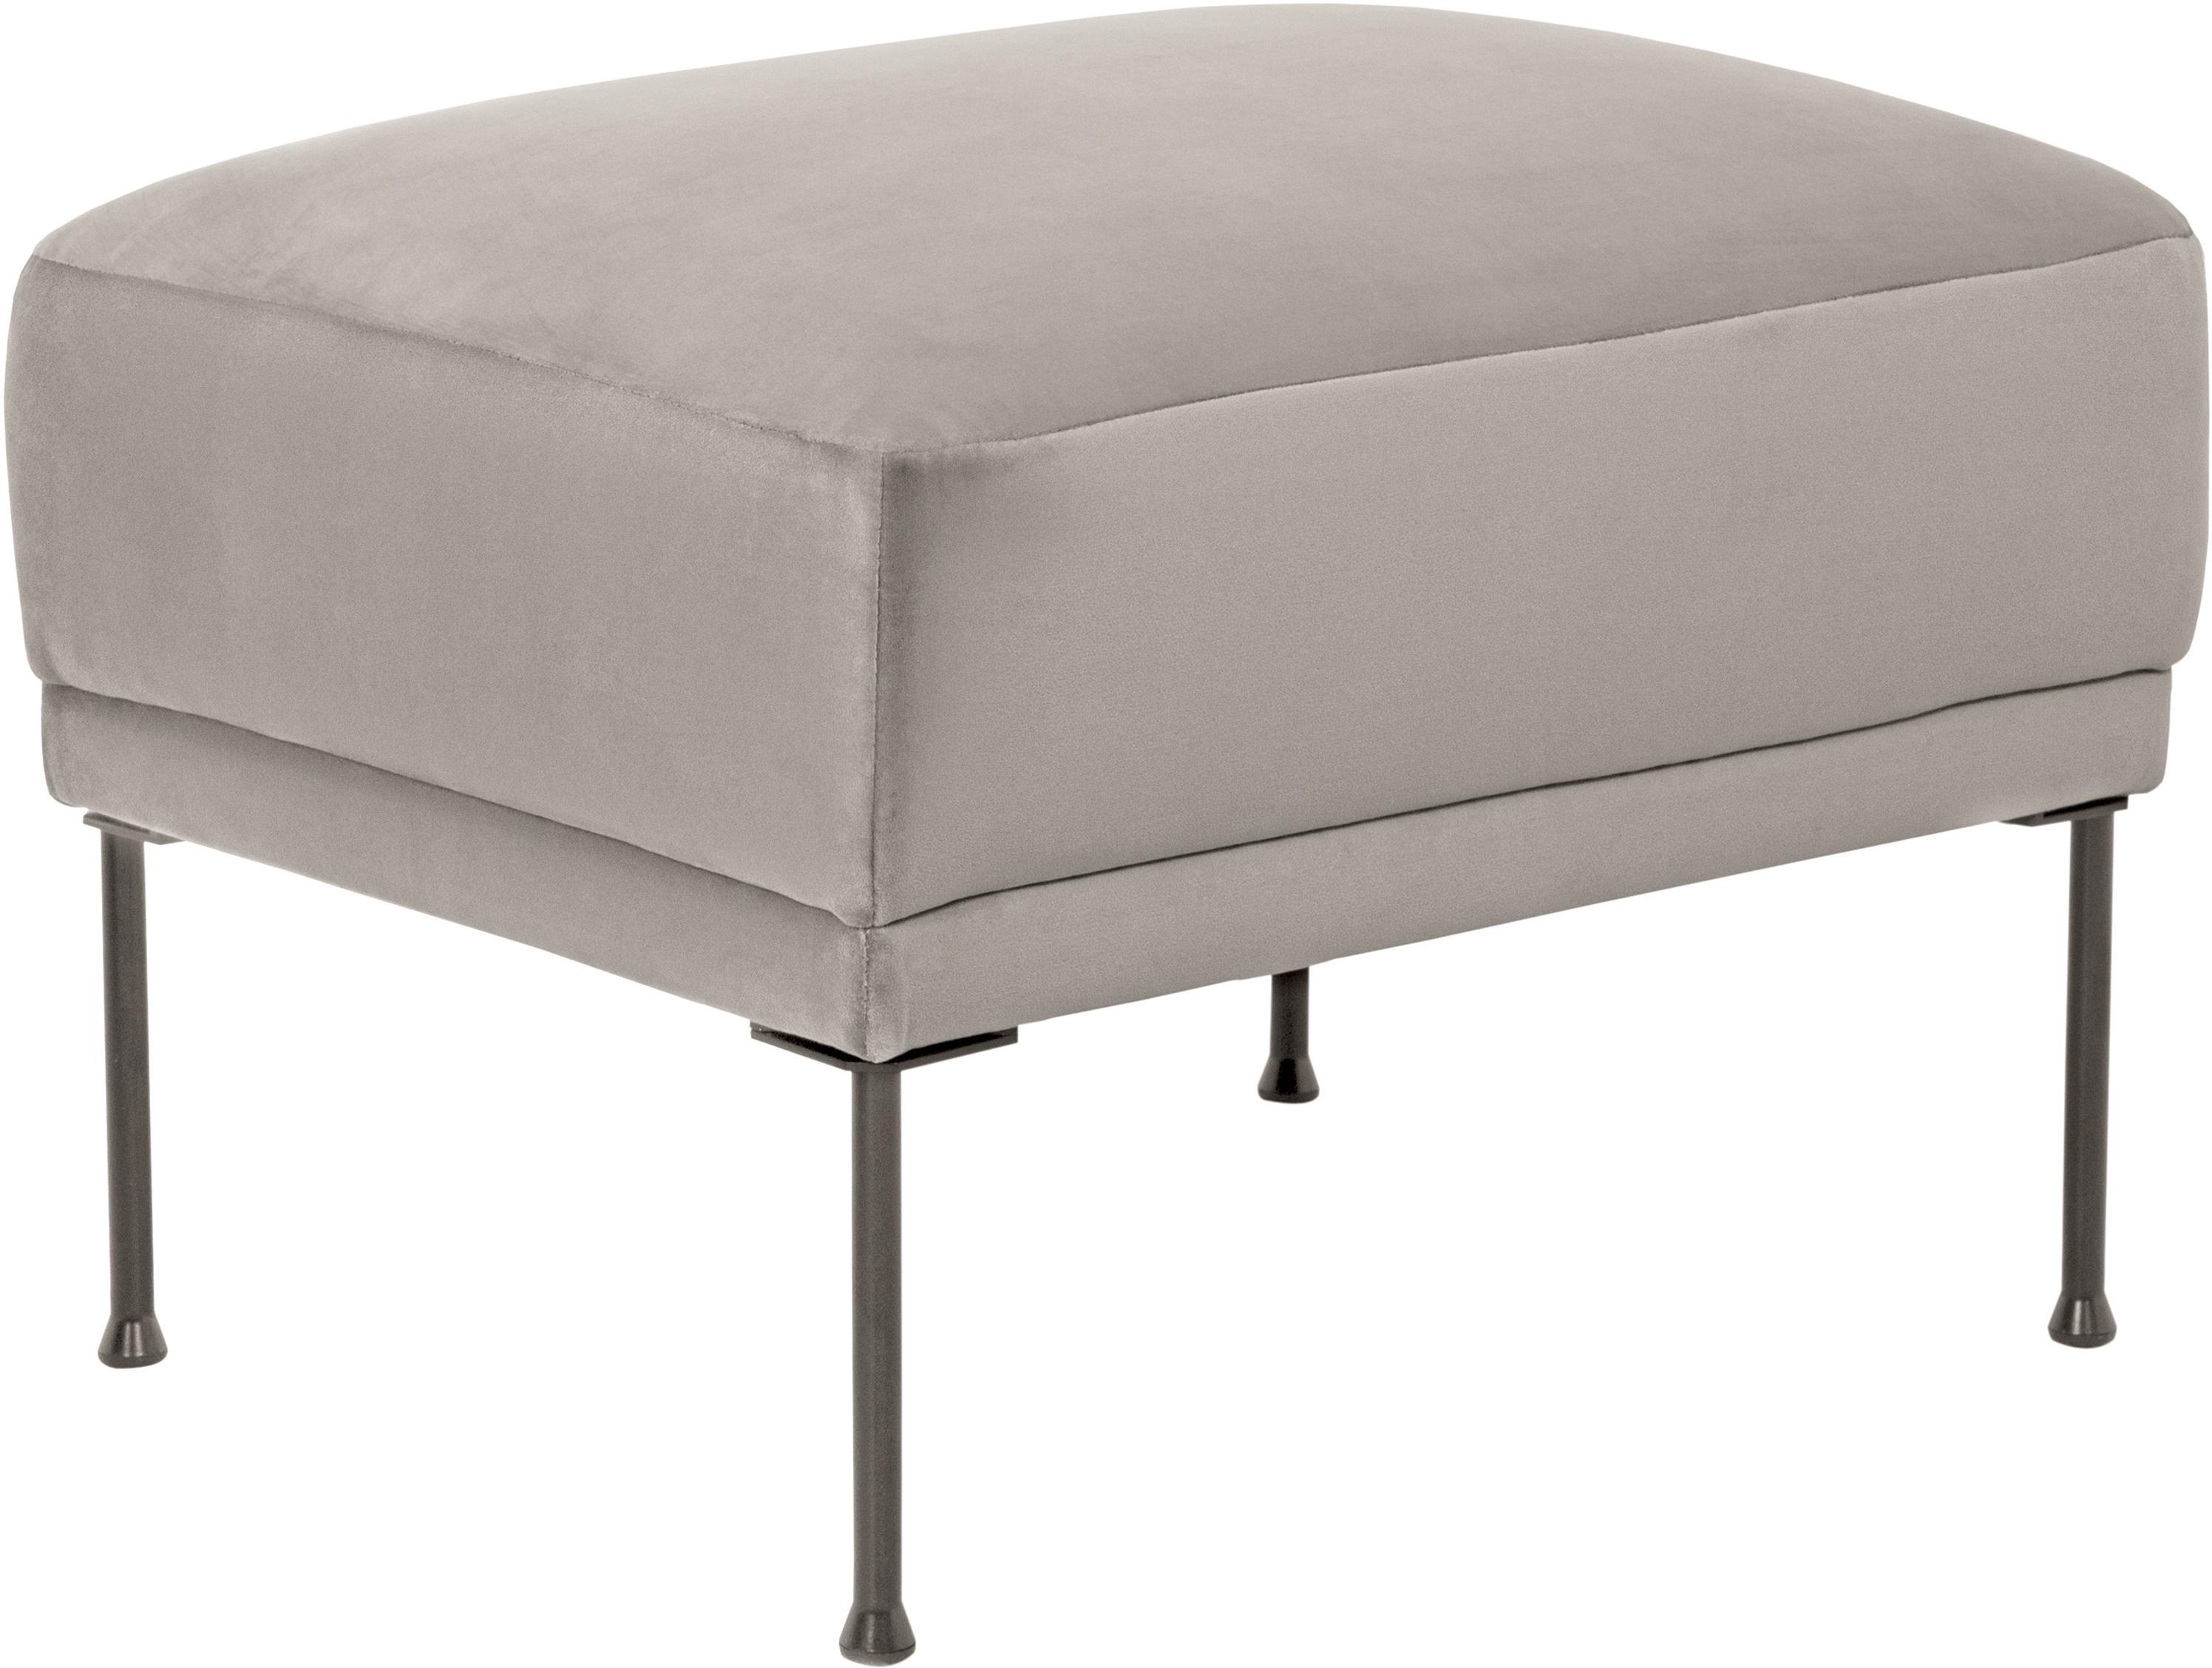 Sofa-Hocker Fluente aus Samt, Bezug: Samt (Hochwertiger Polyes, Gestell: Massives Kiefernholz, Samt Beige, 62 x 46 cm